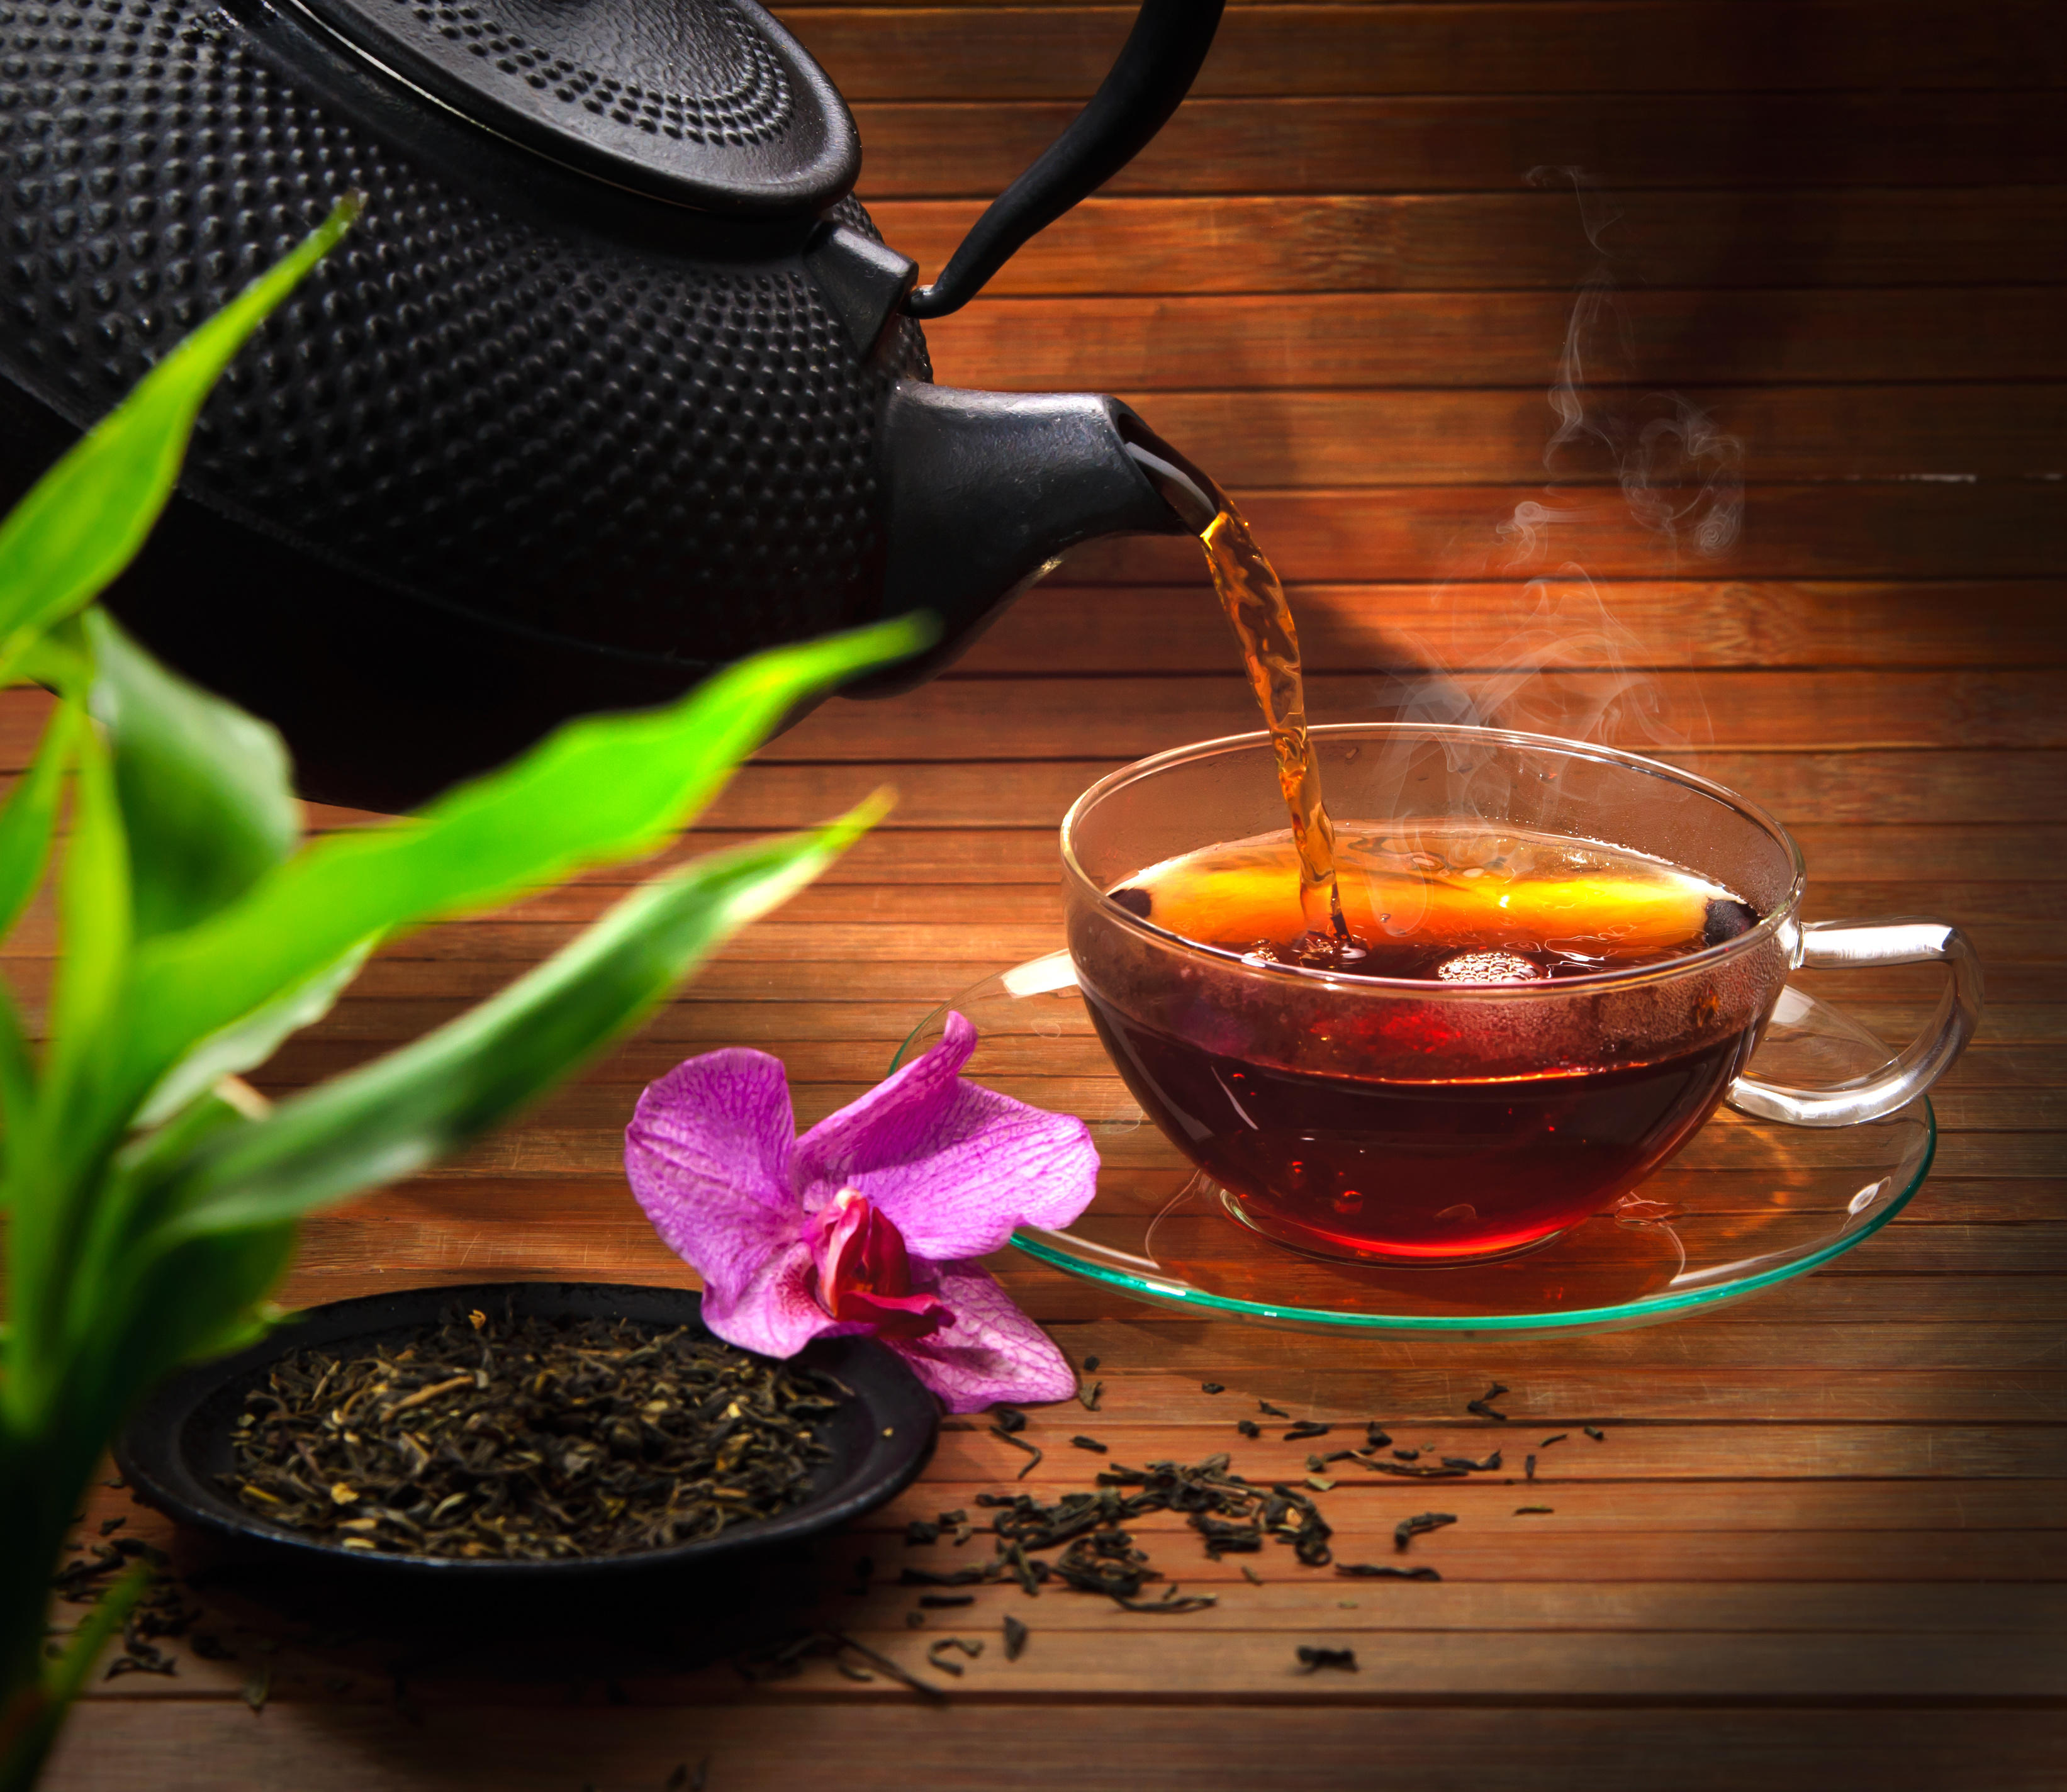 обои чай, кружка, чайник картинки фото